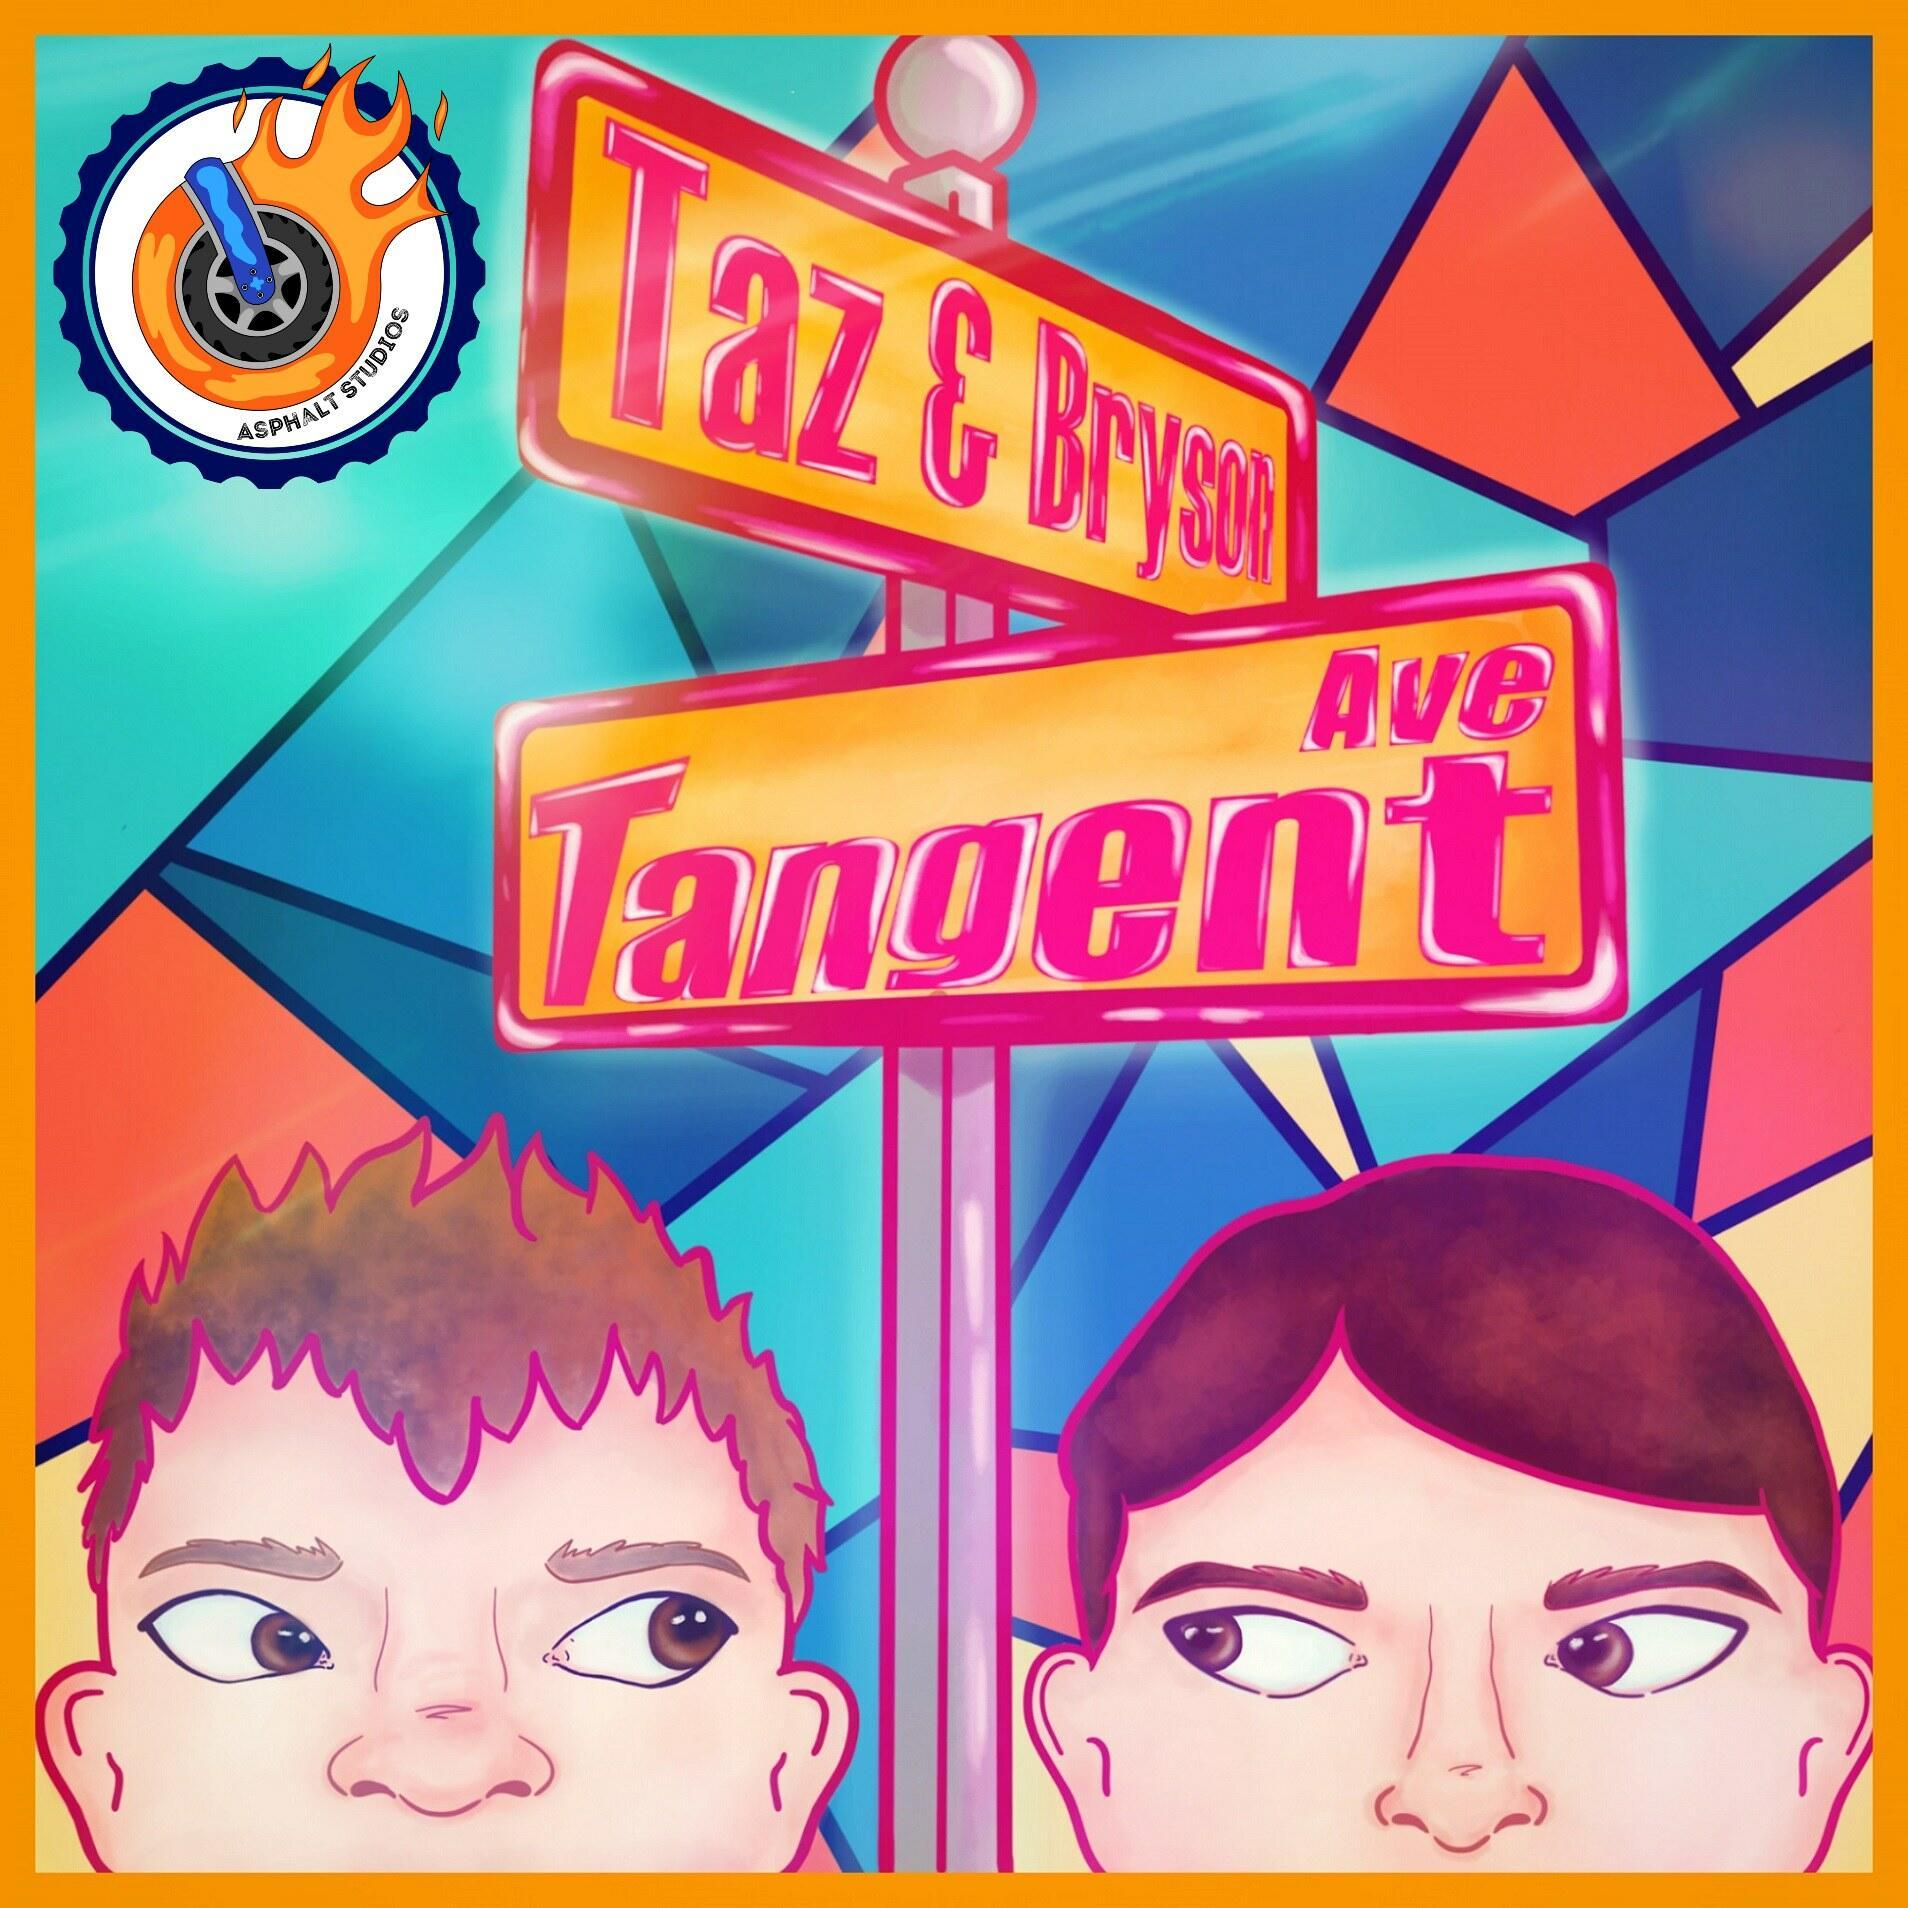 Tangent Avenue